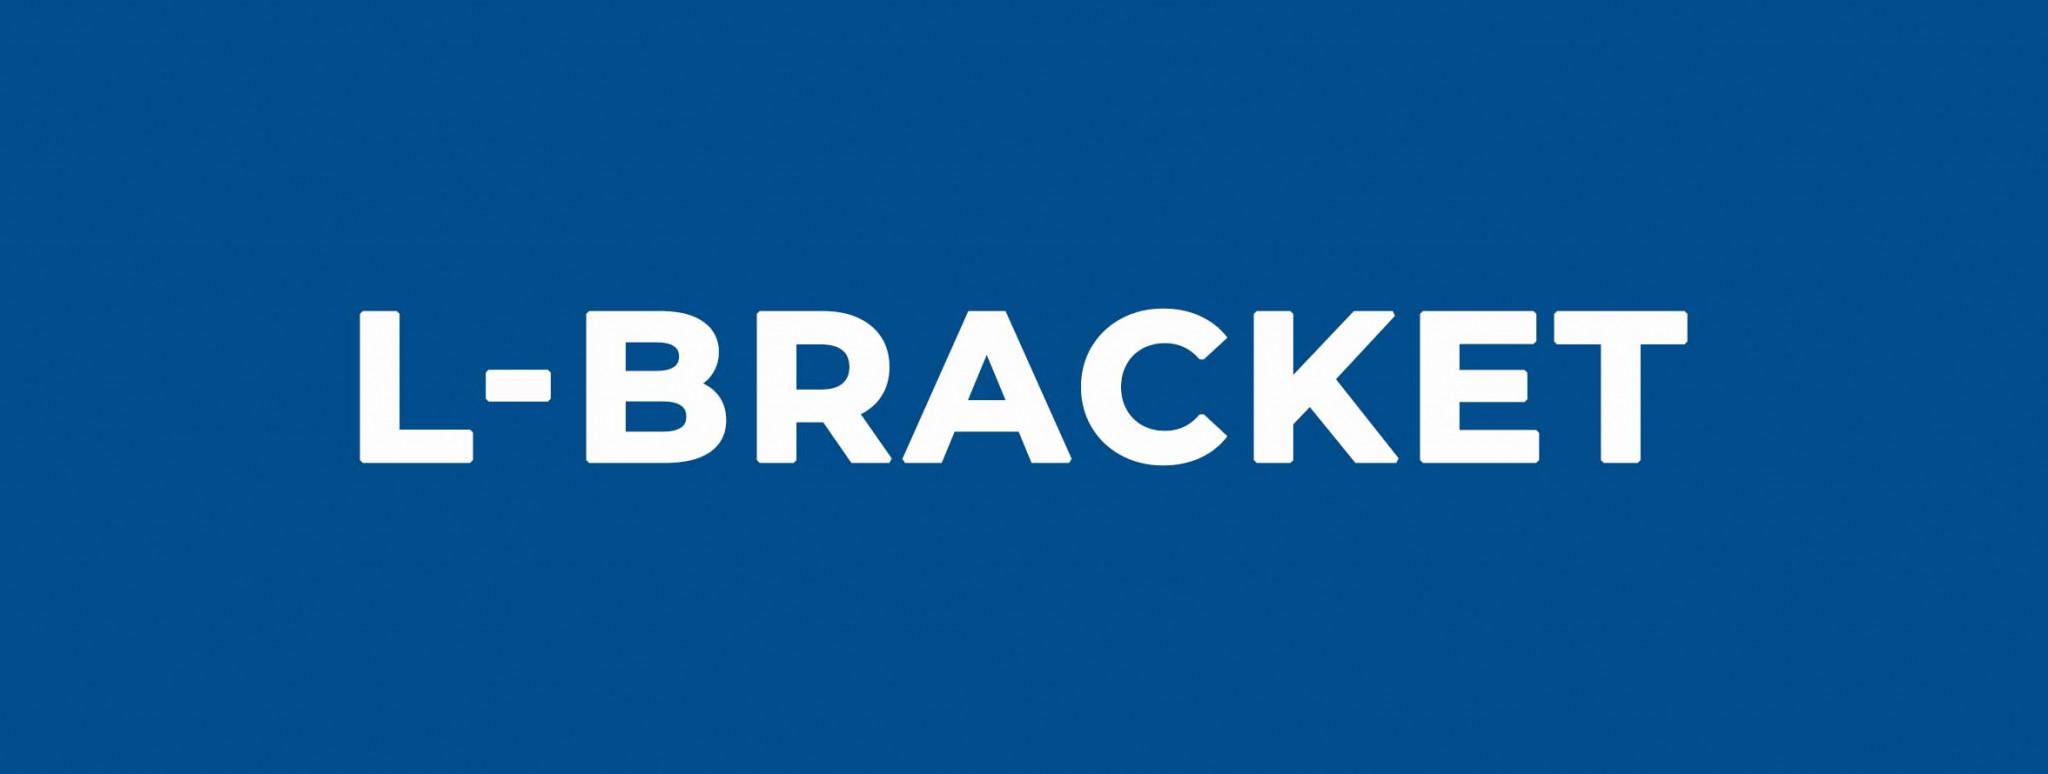 L-Bracket